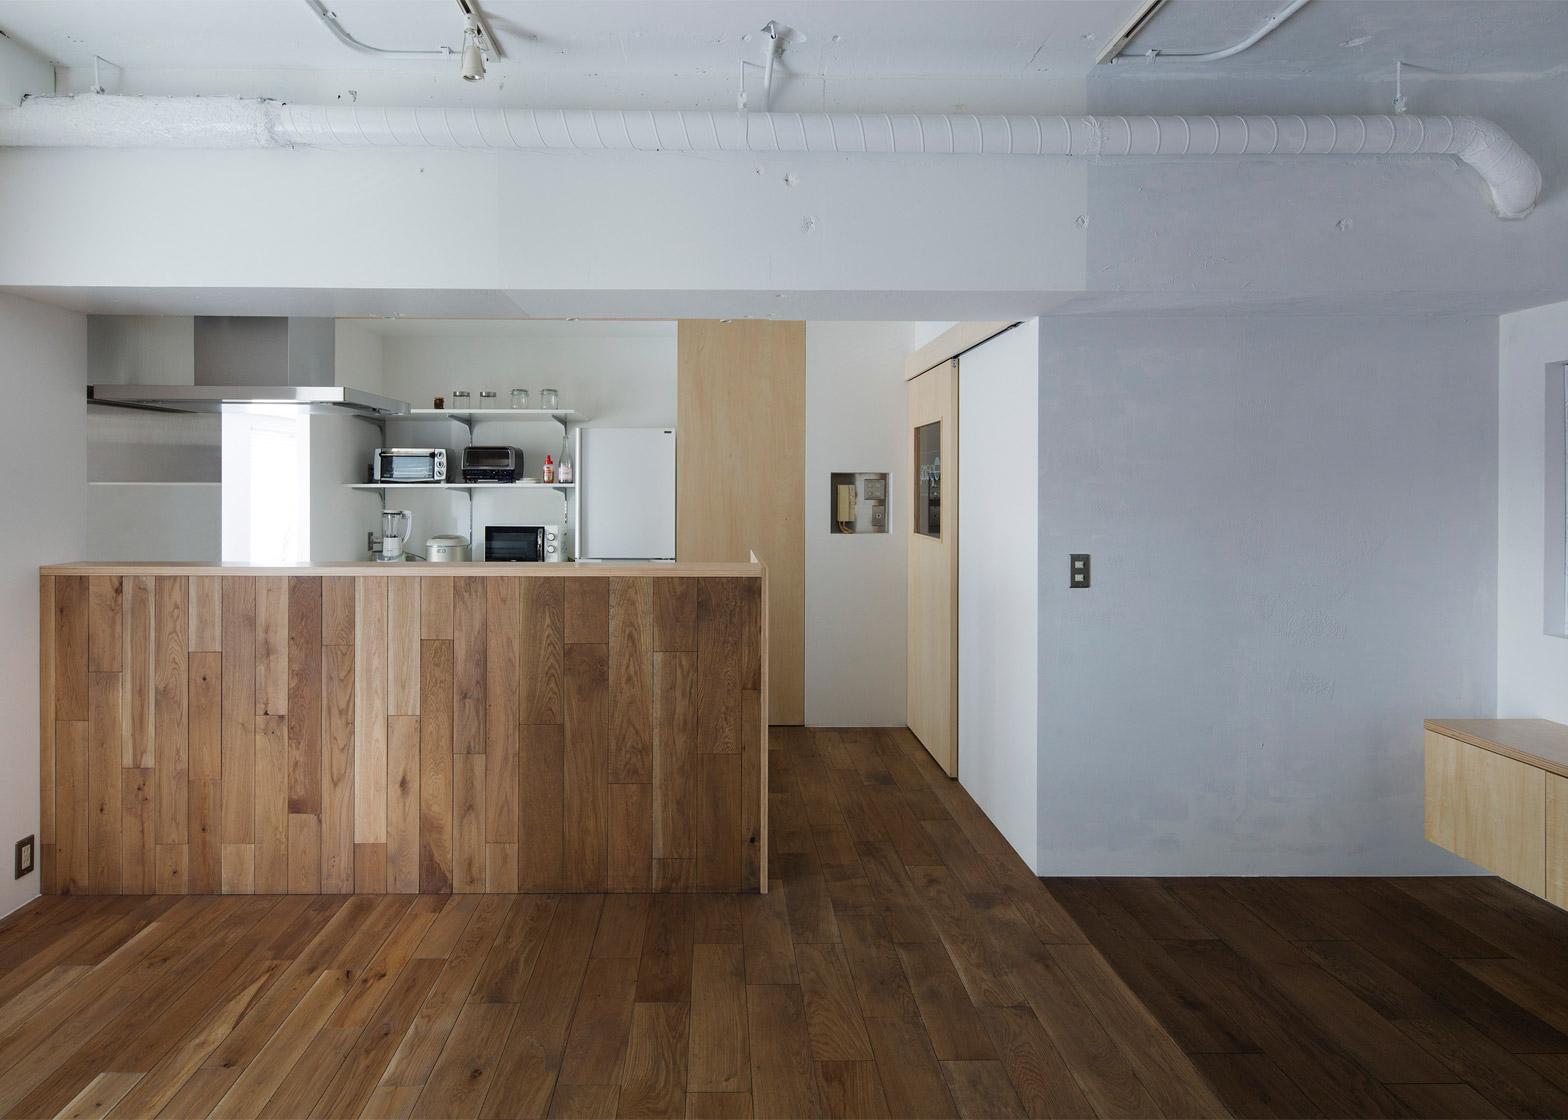 Dessert influences apartment interior by Taka Shinomoto